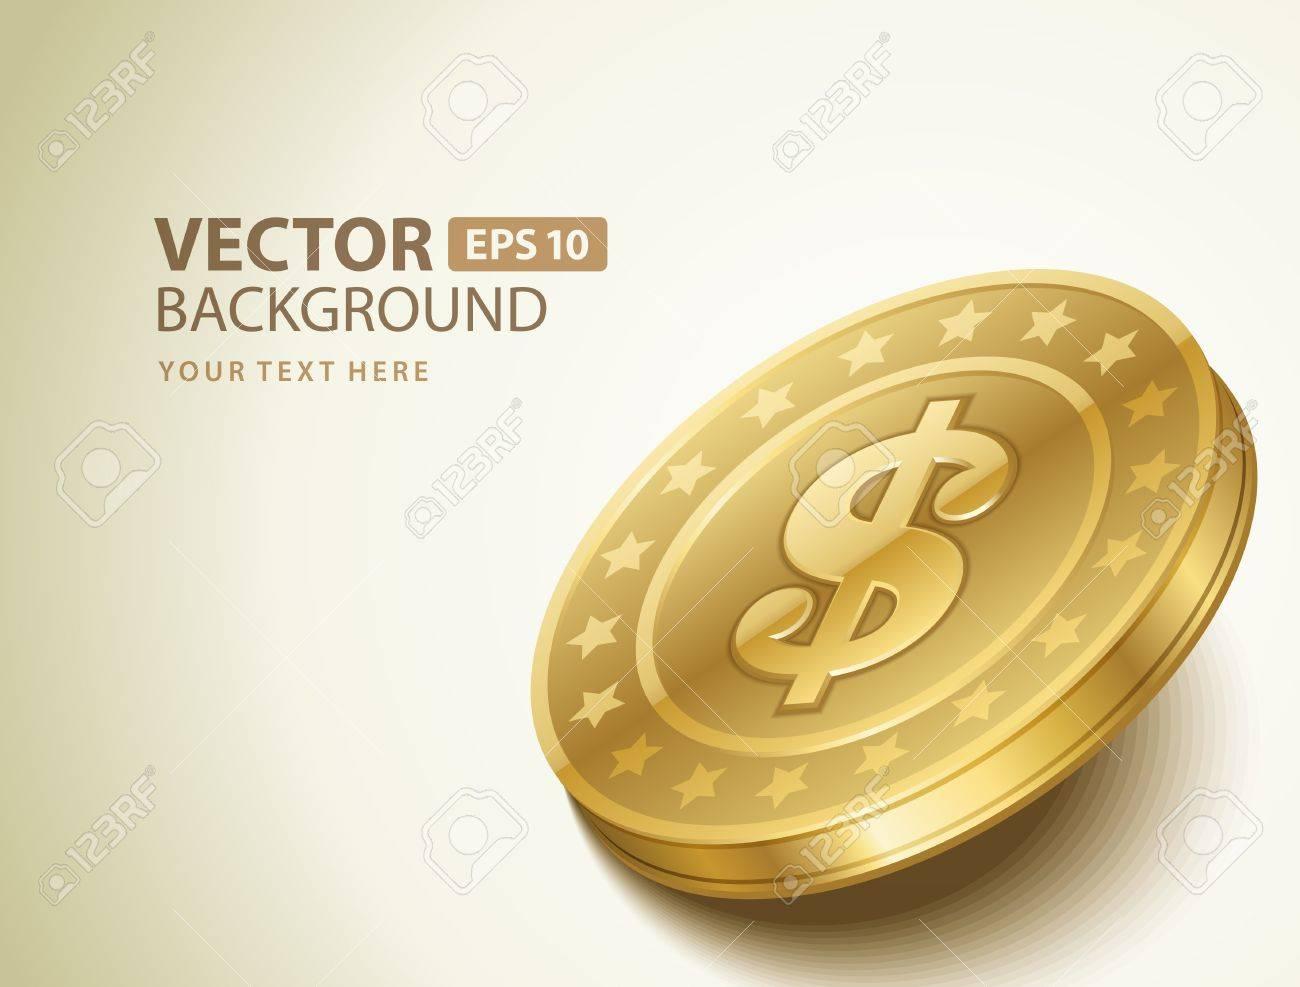 Dollars money coin vector background Stock Vector - 14760693